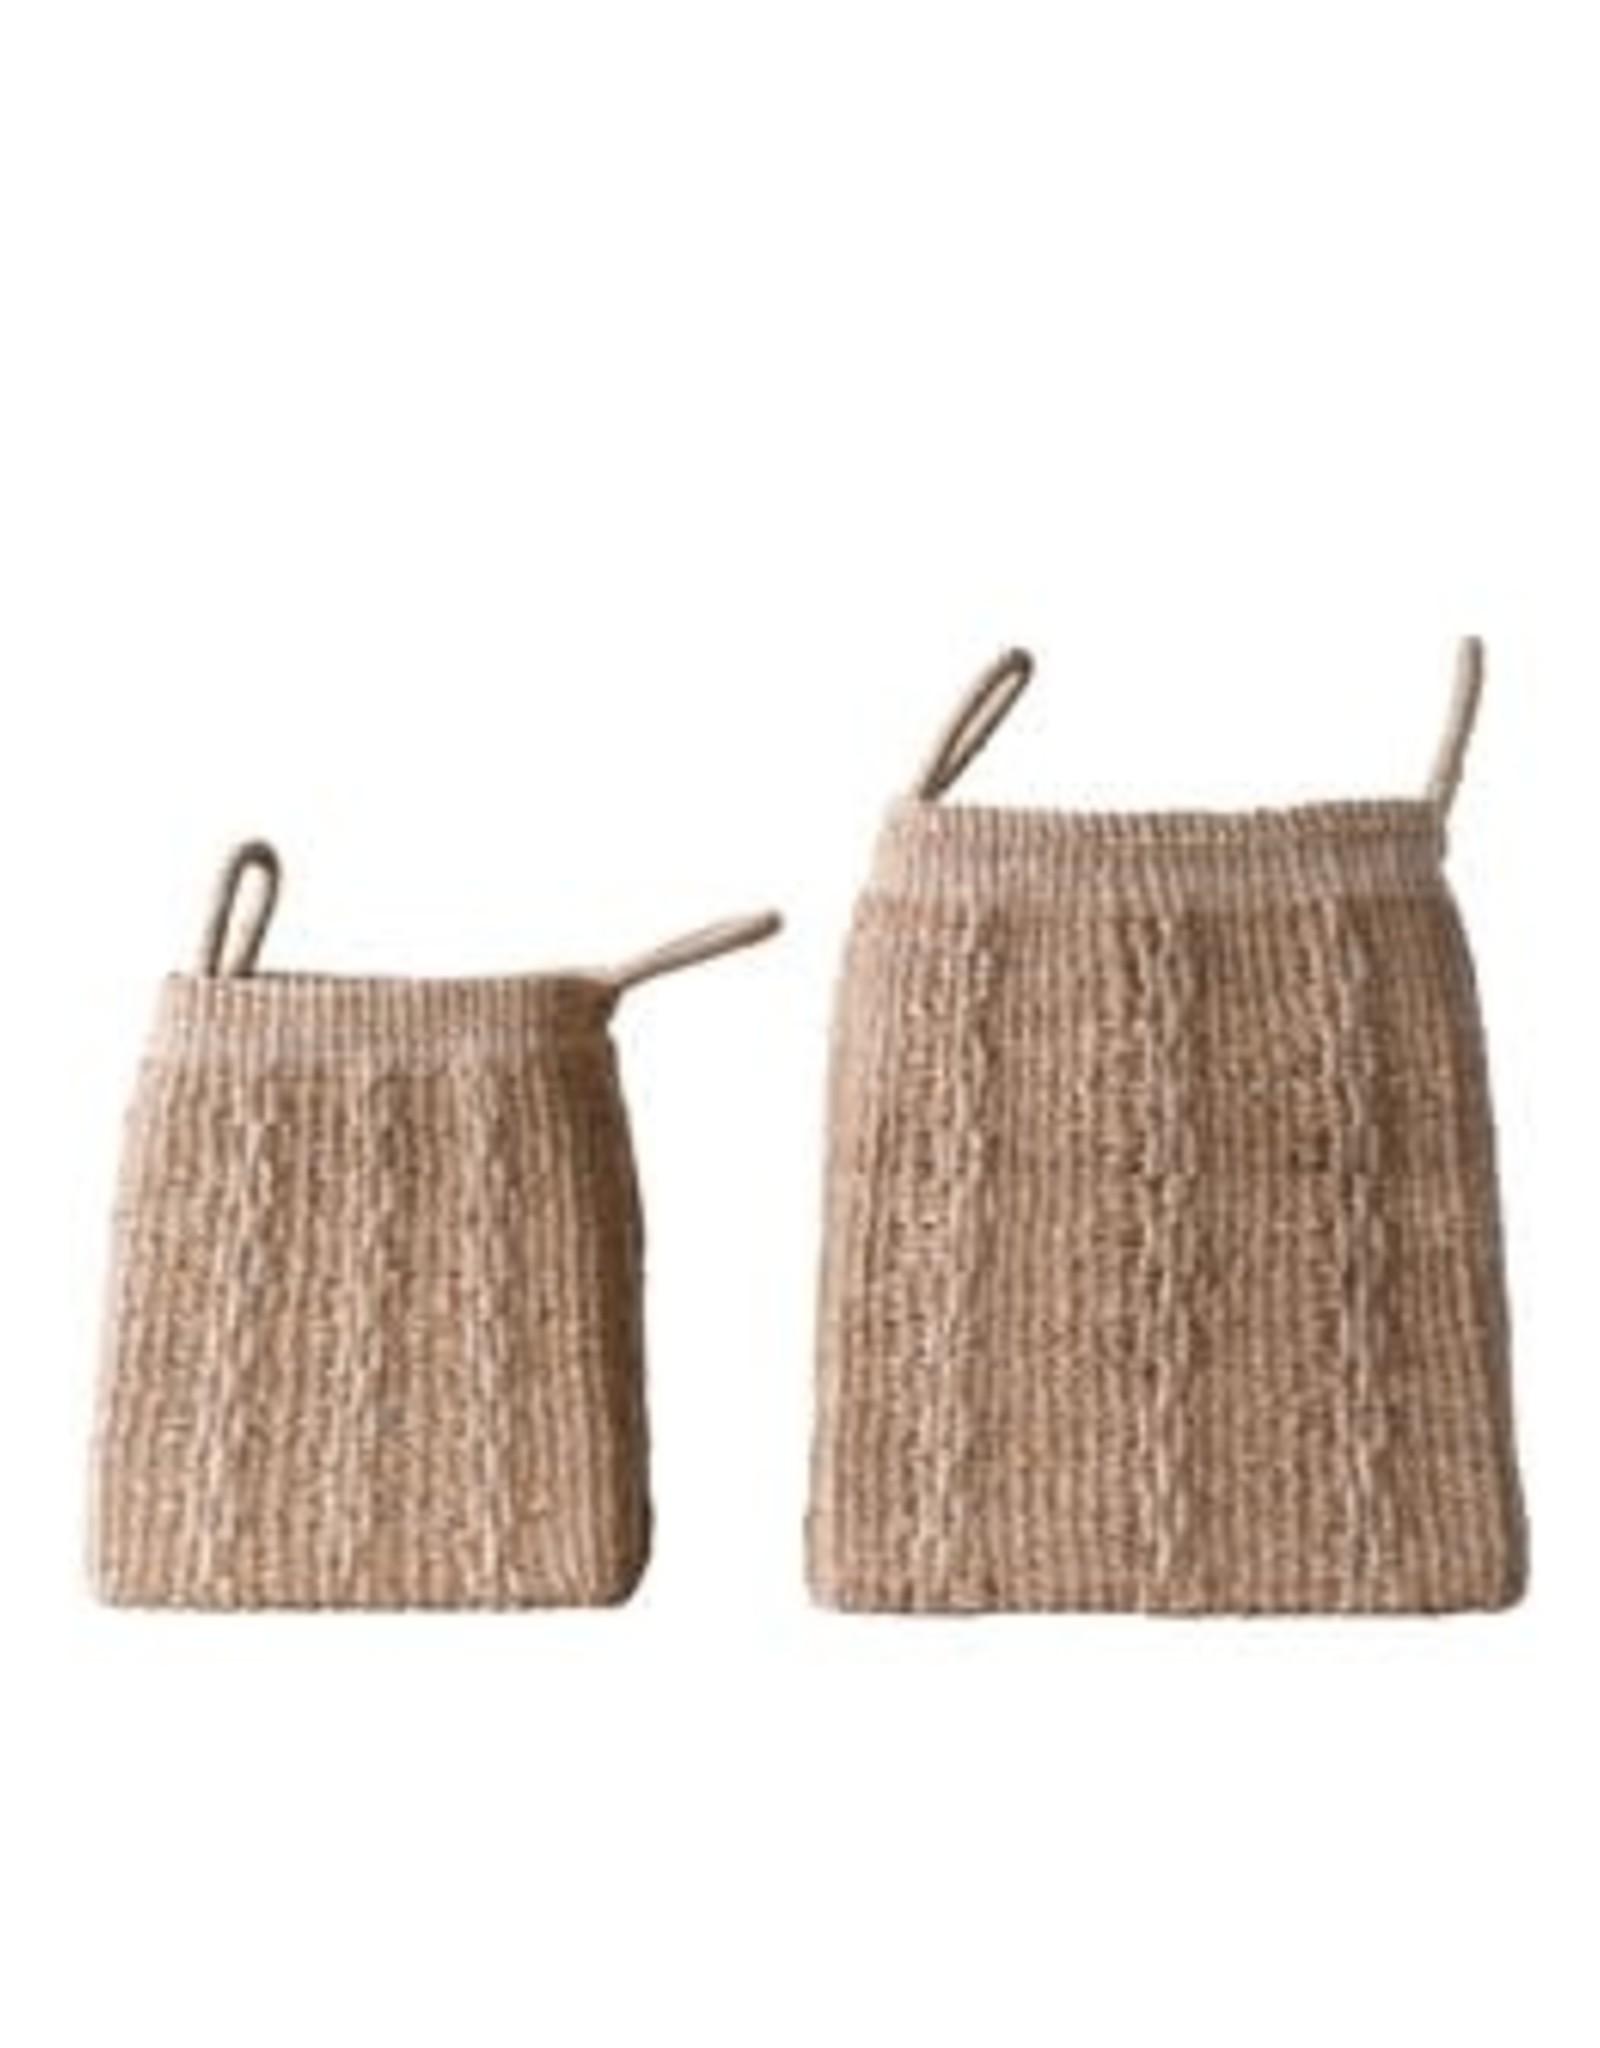 Website Abaca Hand-Woven Baskets